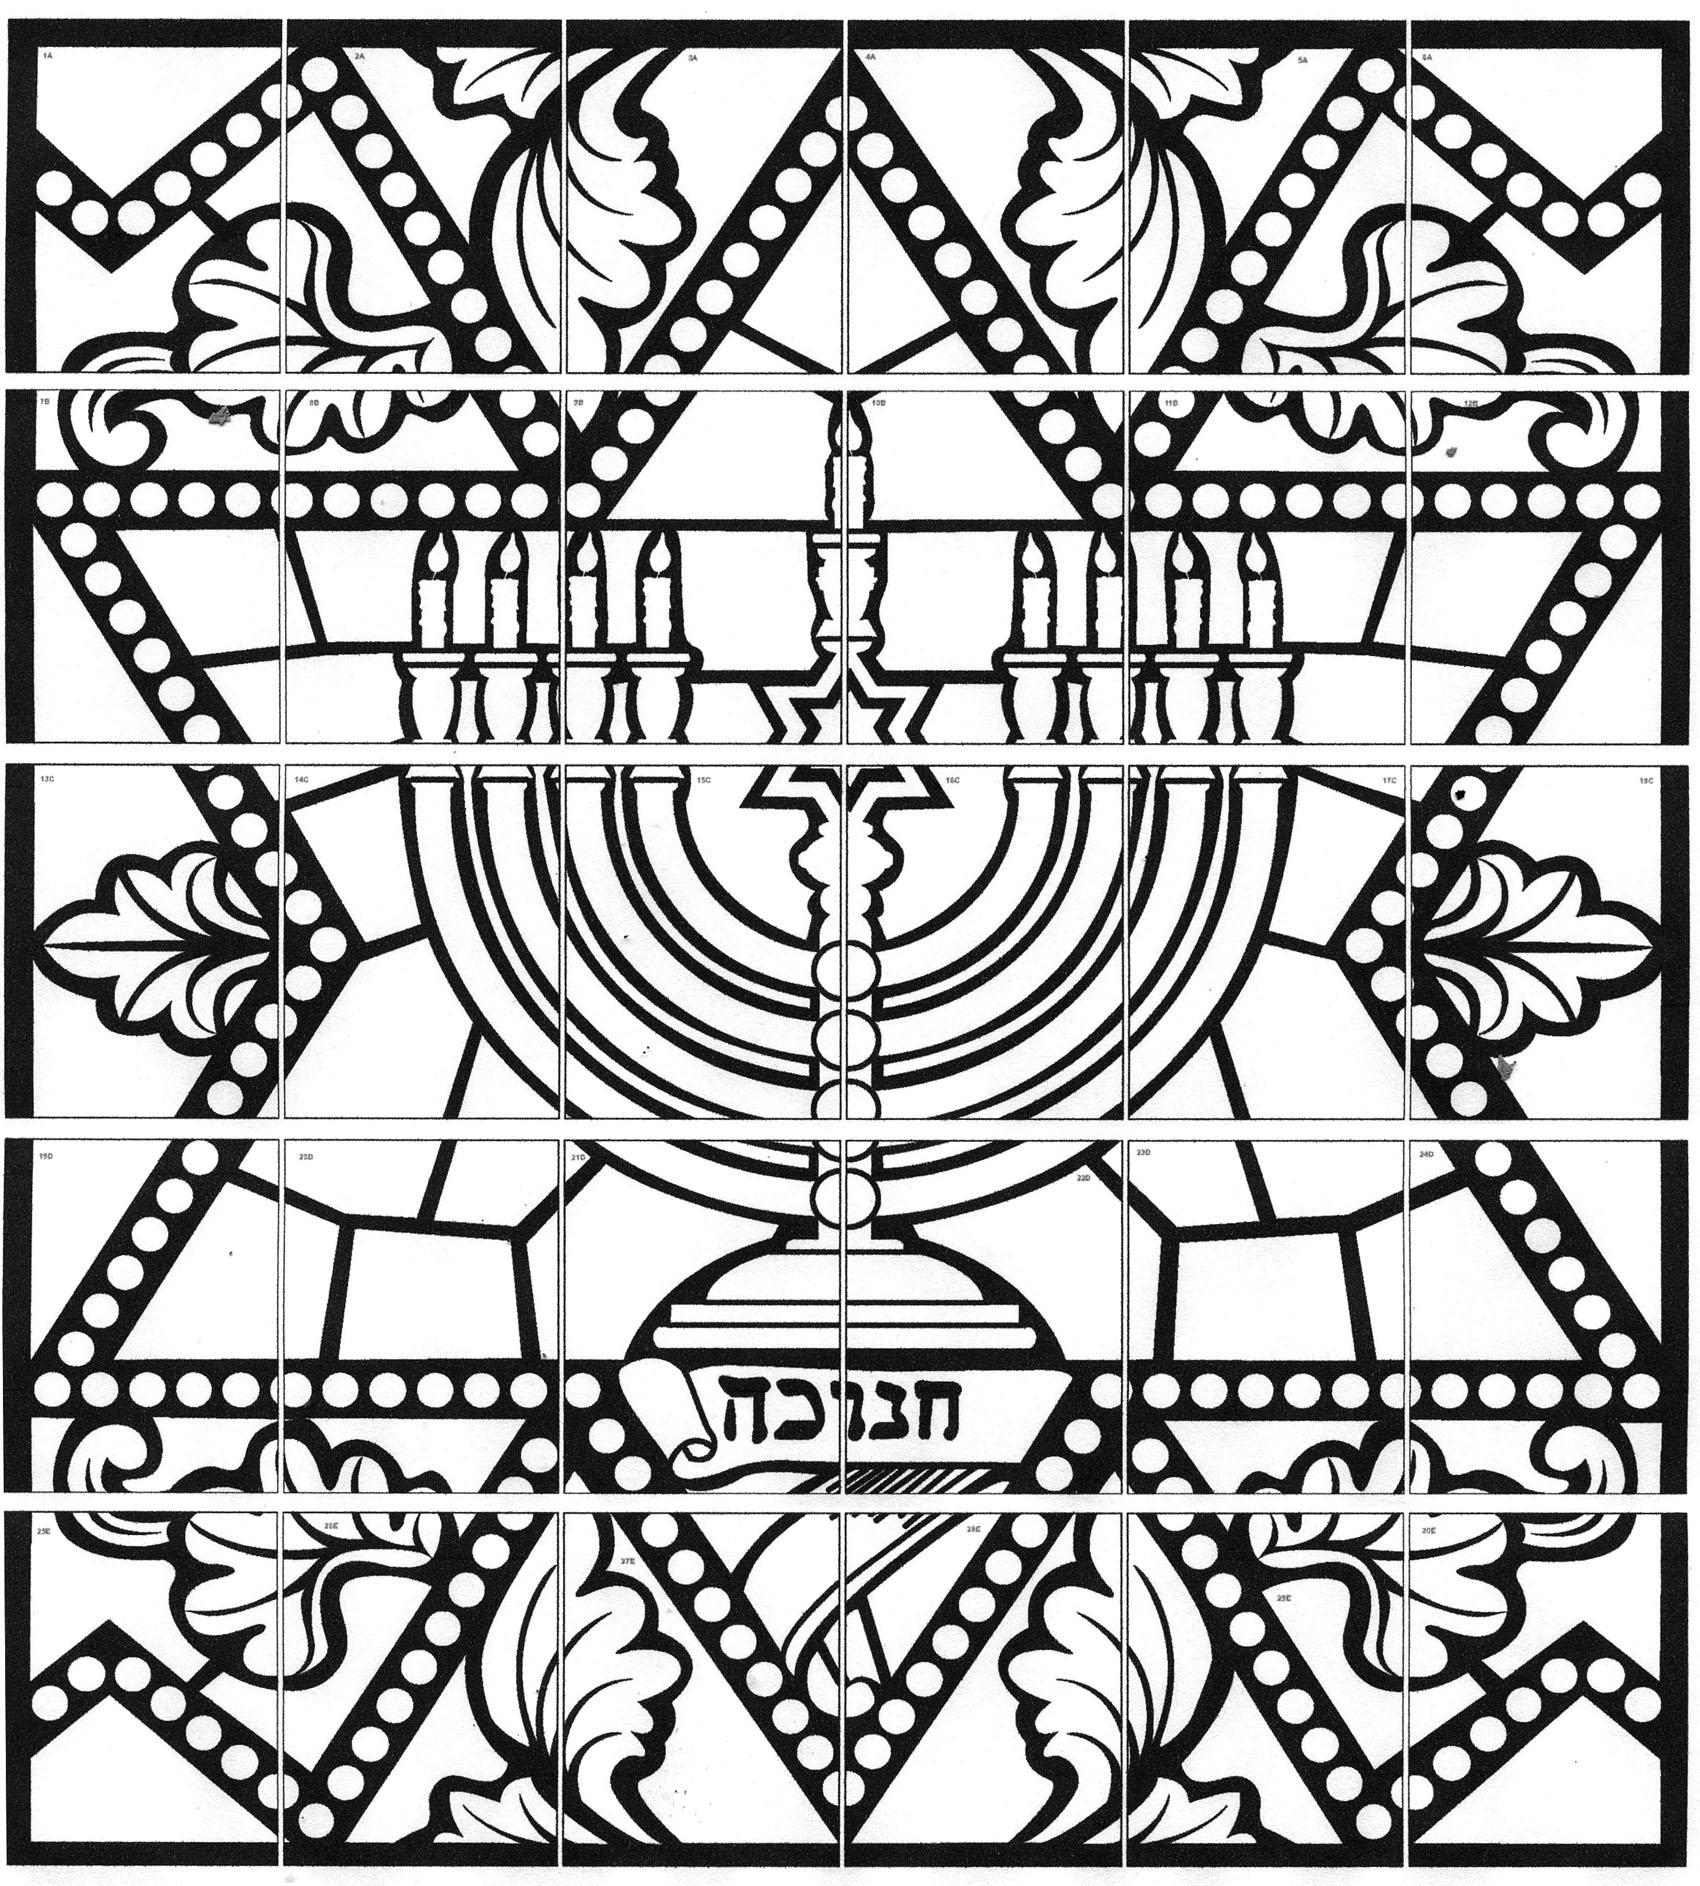 Hanukkah Mural Art Projects For Kids